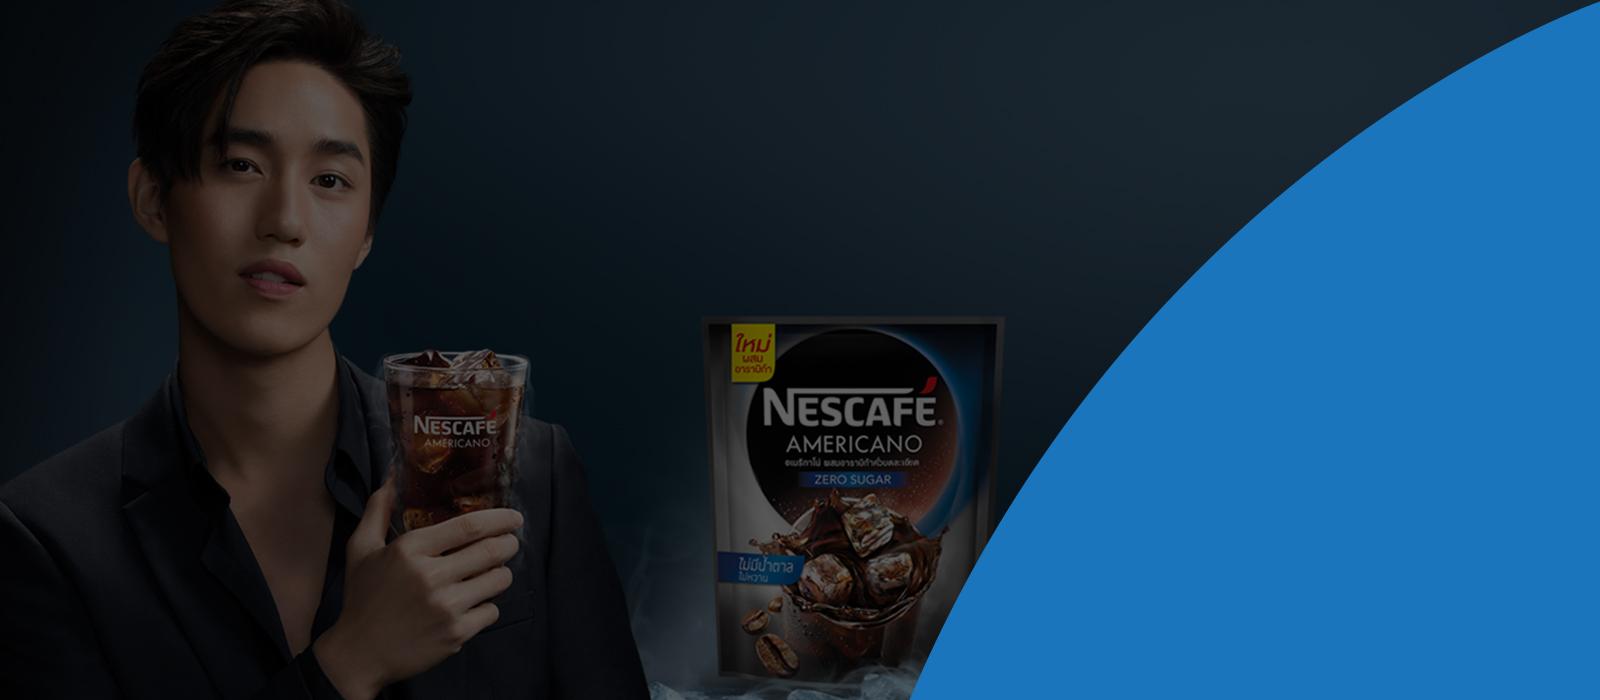 Tea and coffee advertisement